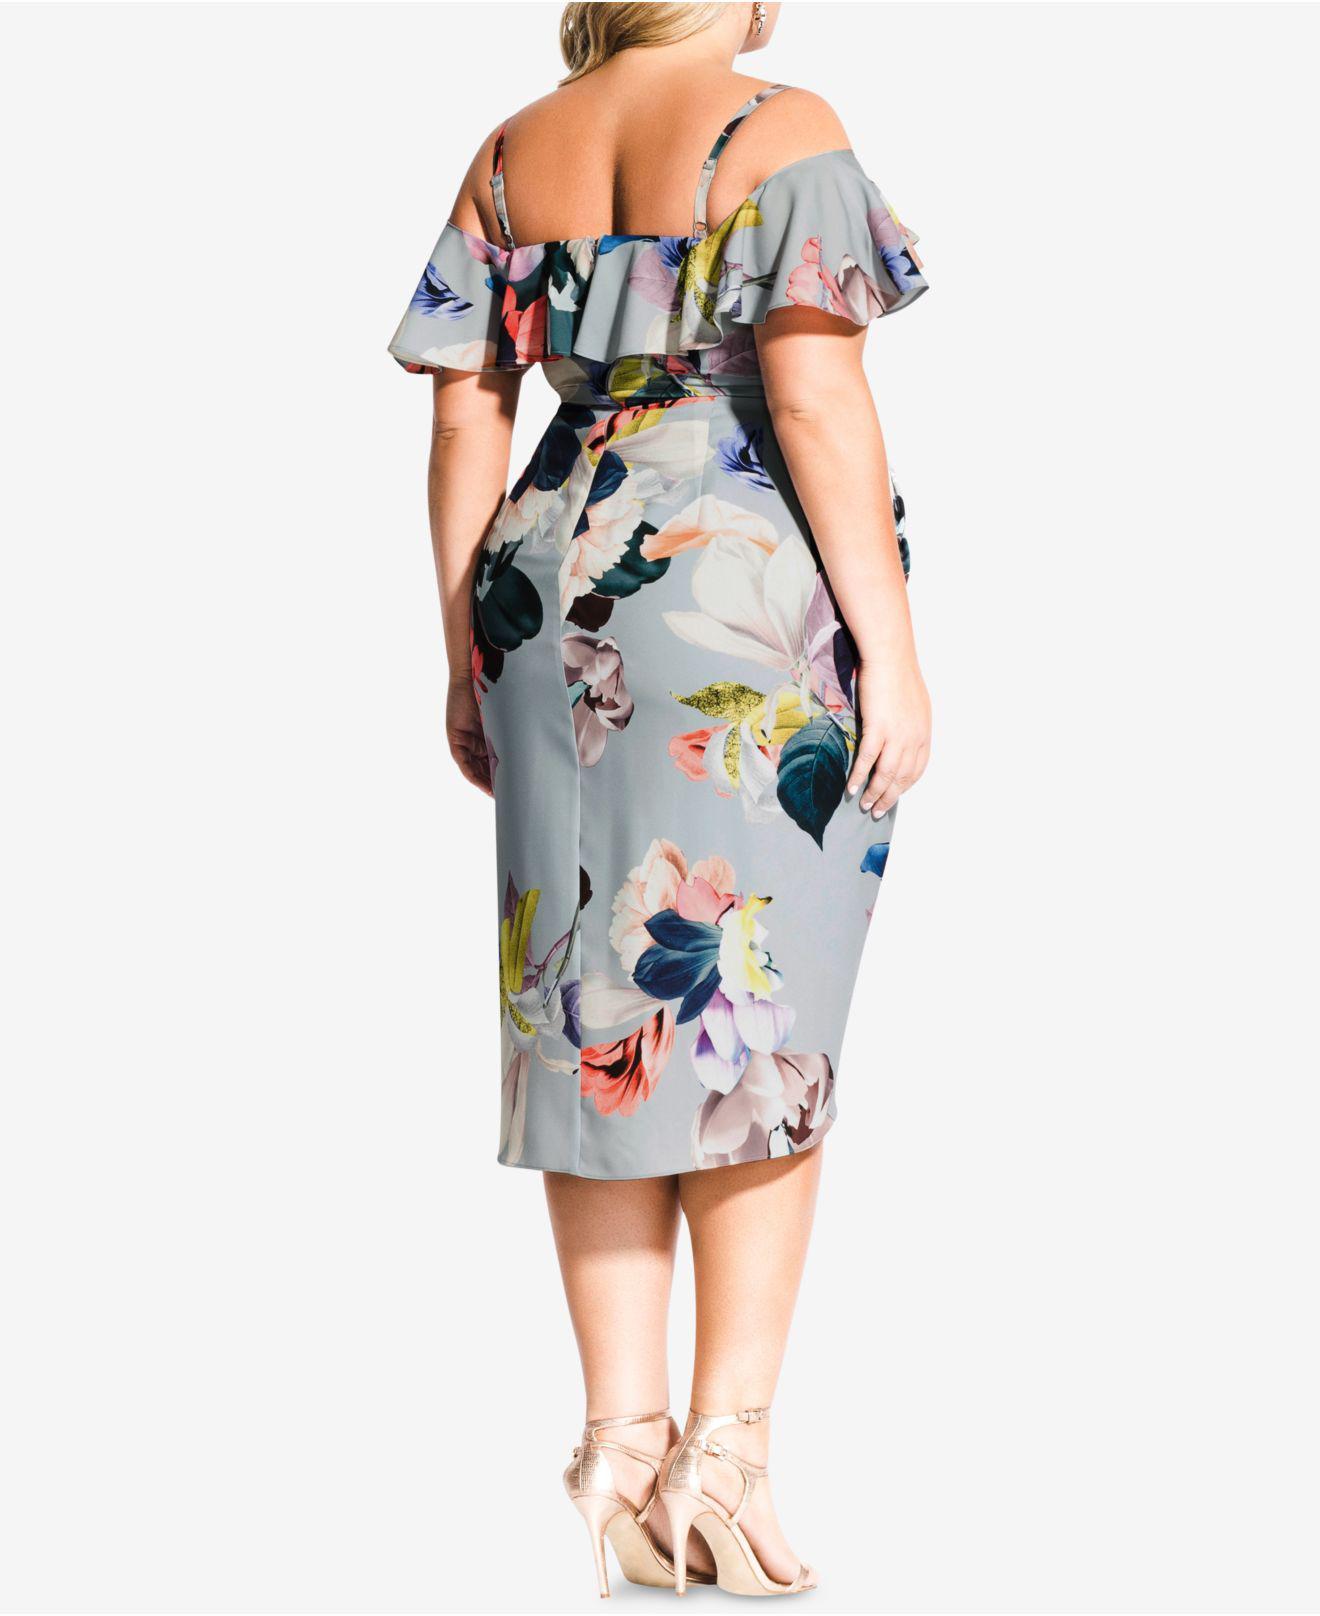 cccb32b590f8e Lyst - City Chic Trendy Plus Size Ruffled Faux-wrap Dress